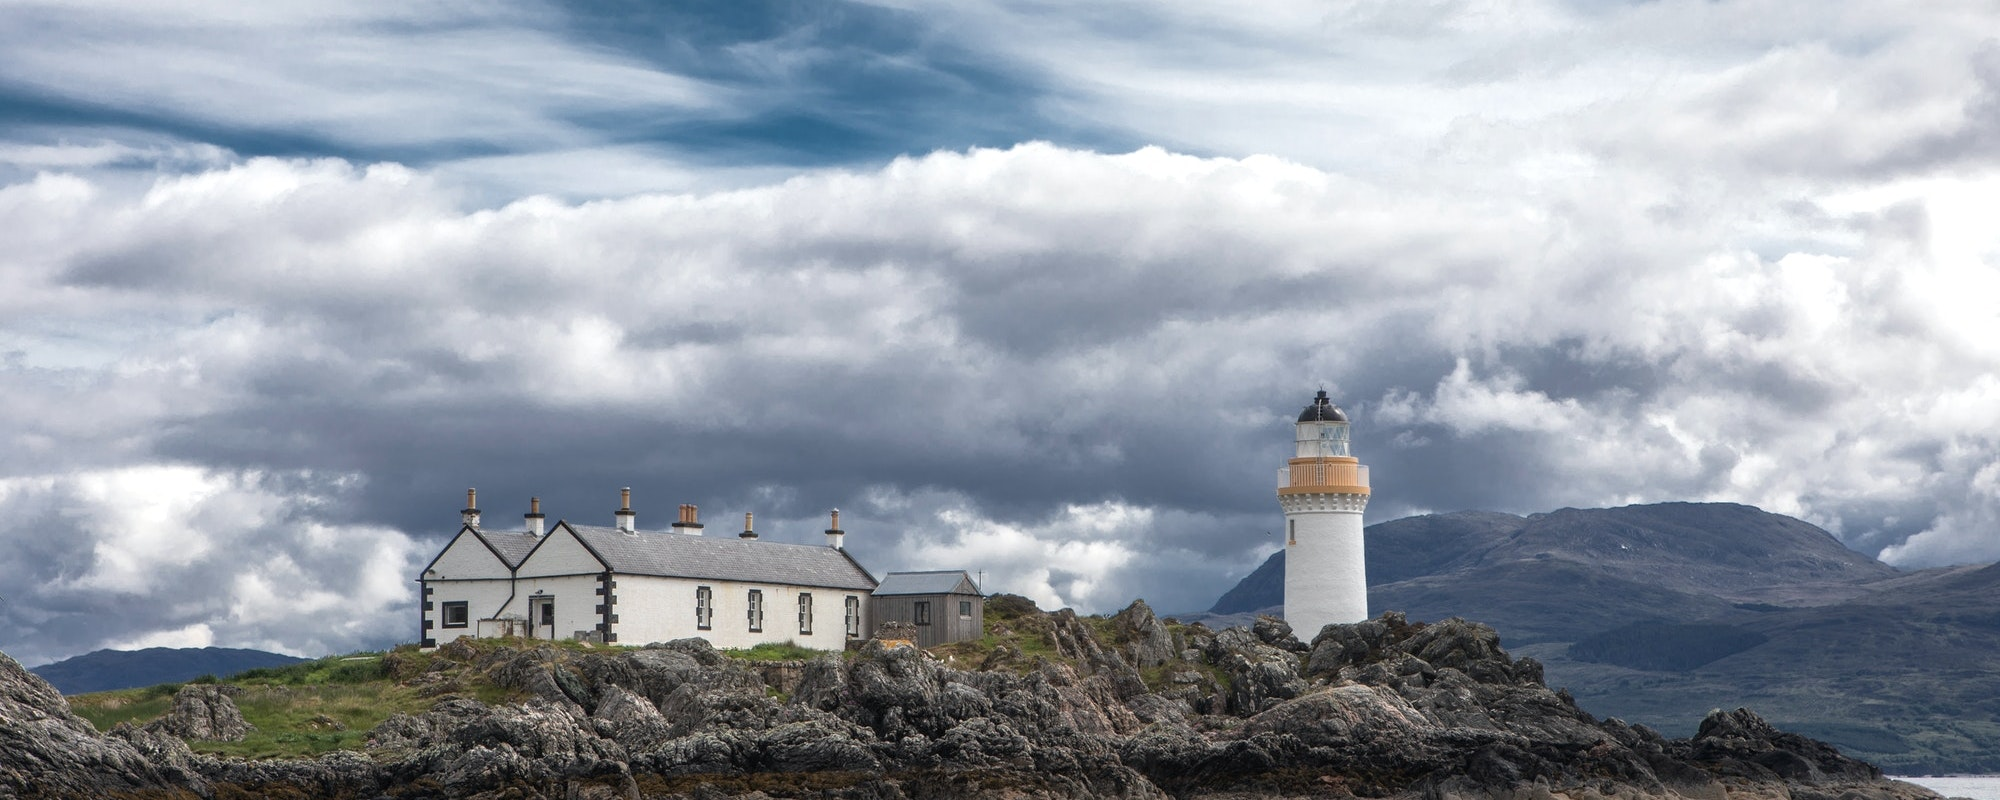 Eilean Sionnach Lighthouse Cottage